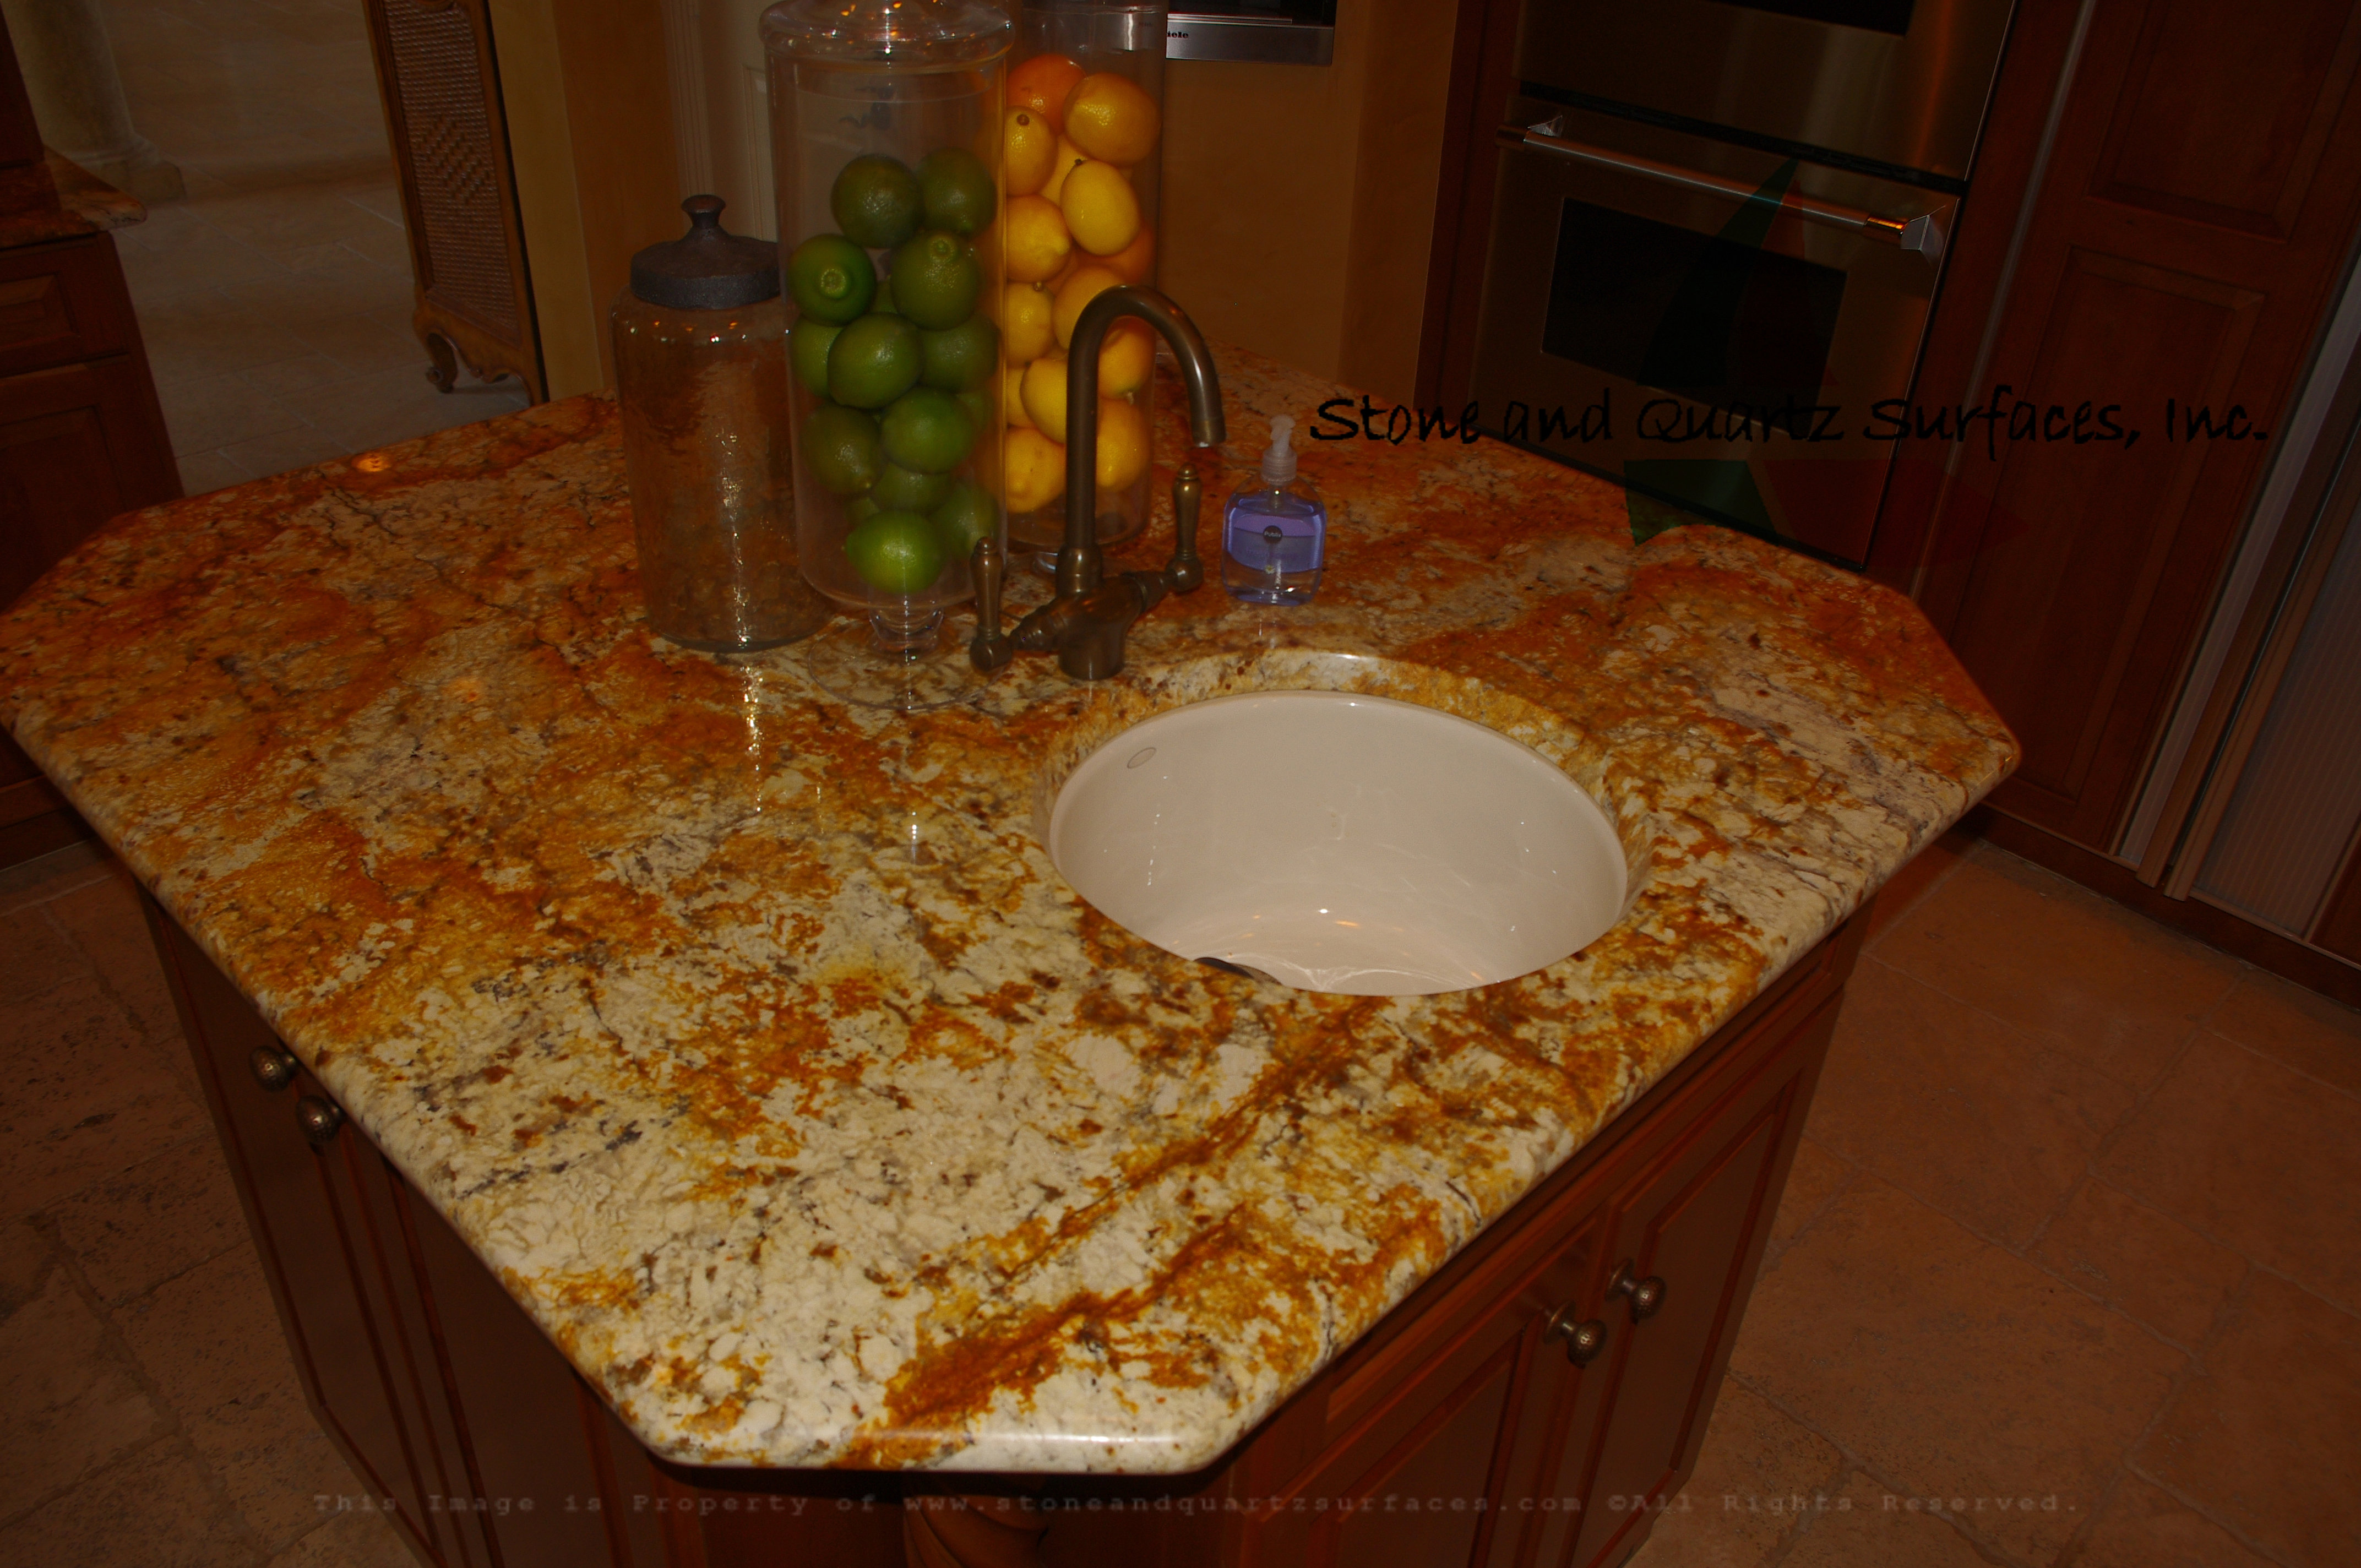 Countertops Boca Raton Fl We Fabricate And Install